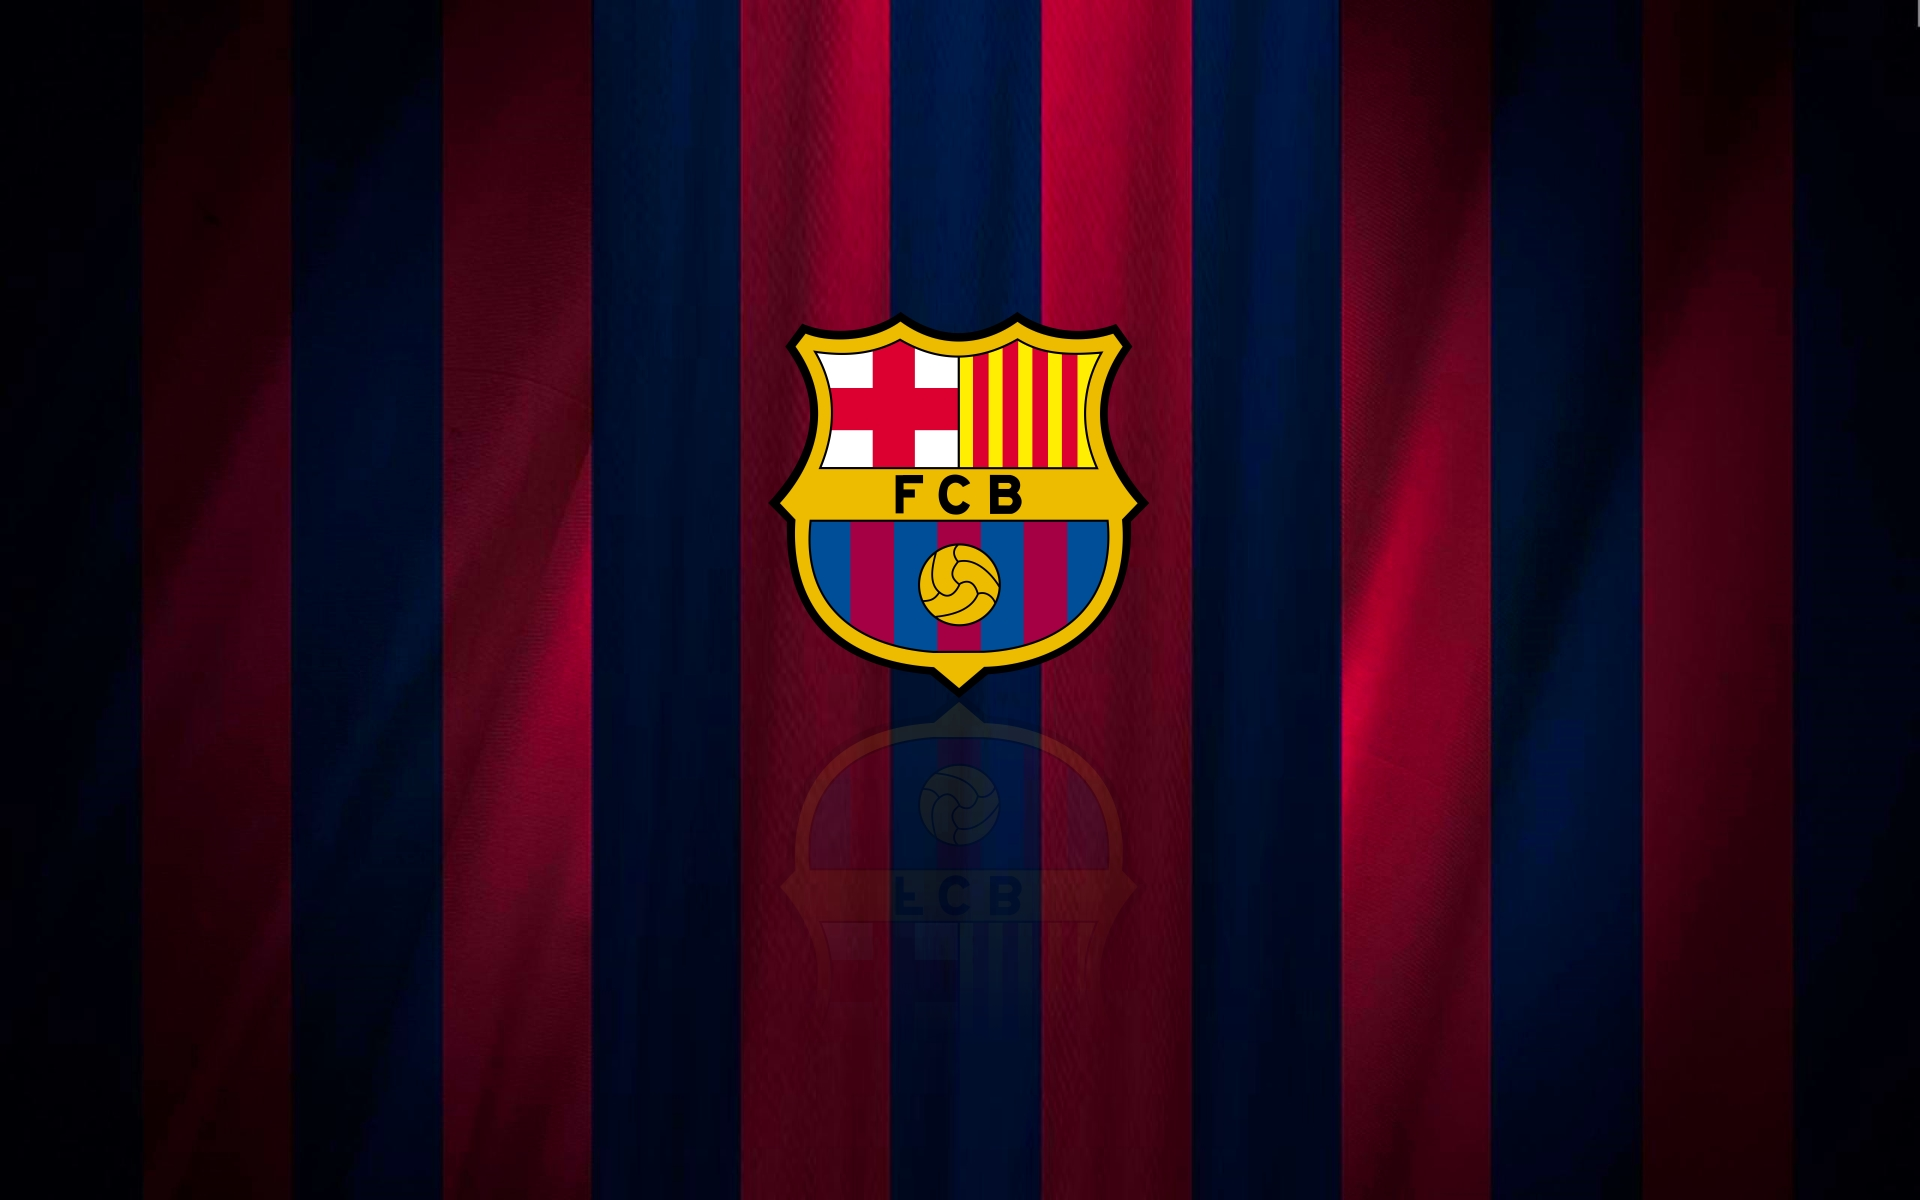 fc barcelona logos download